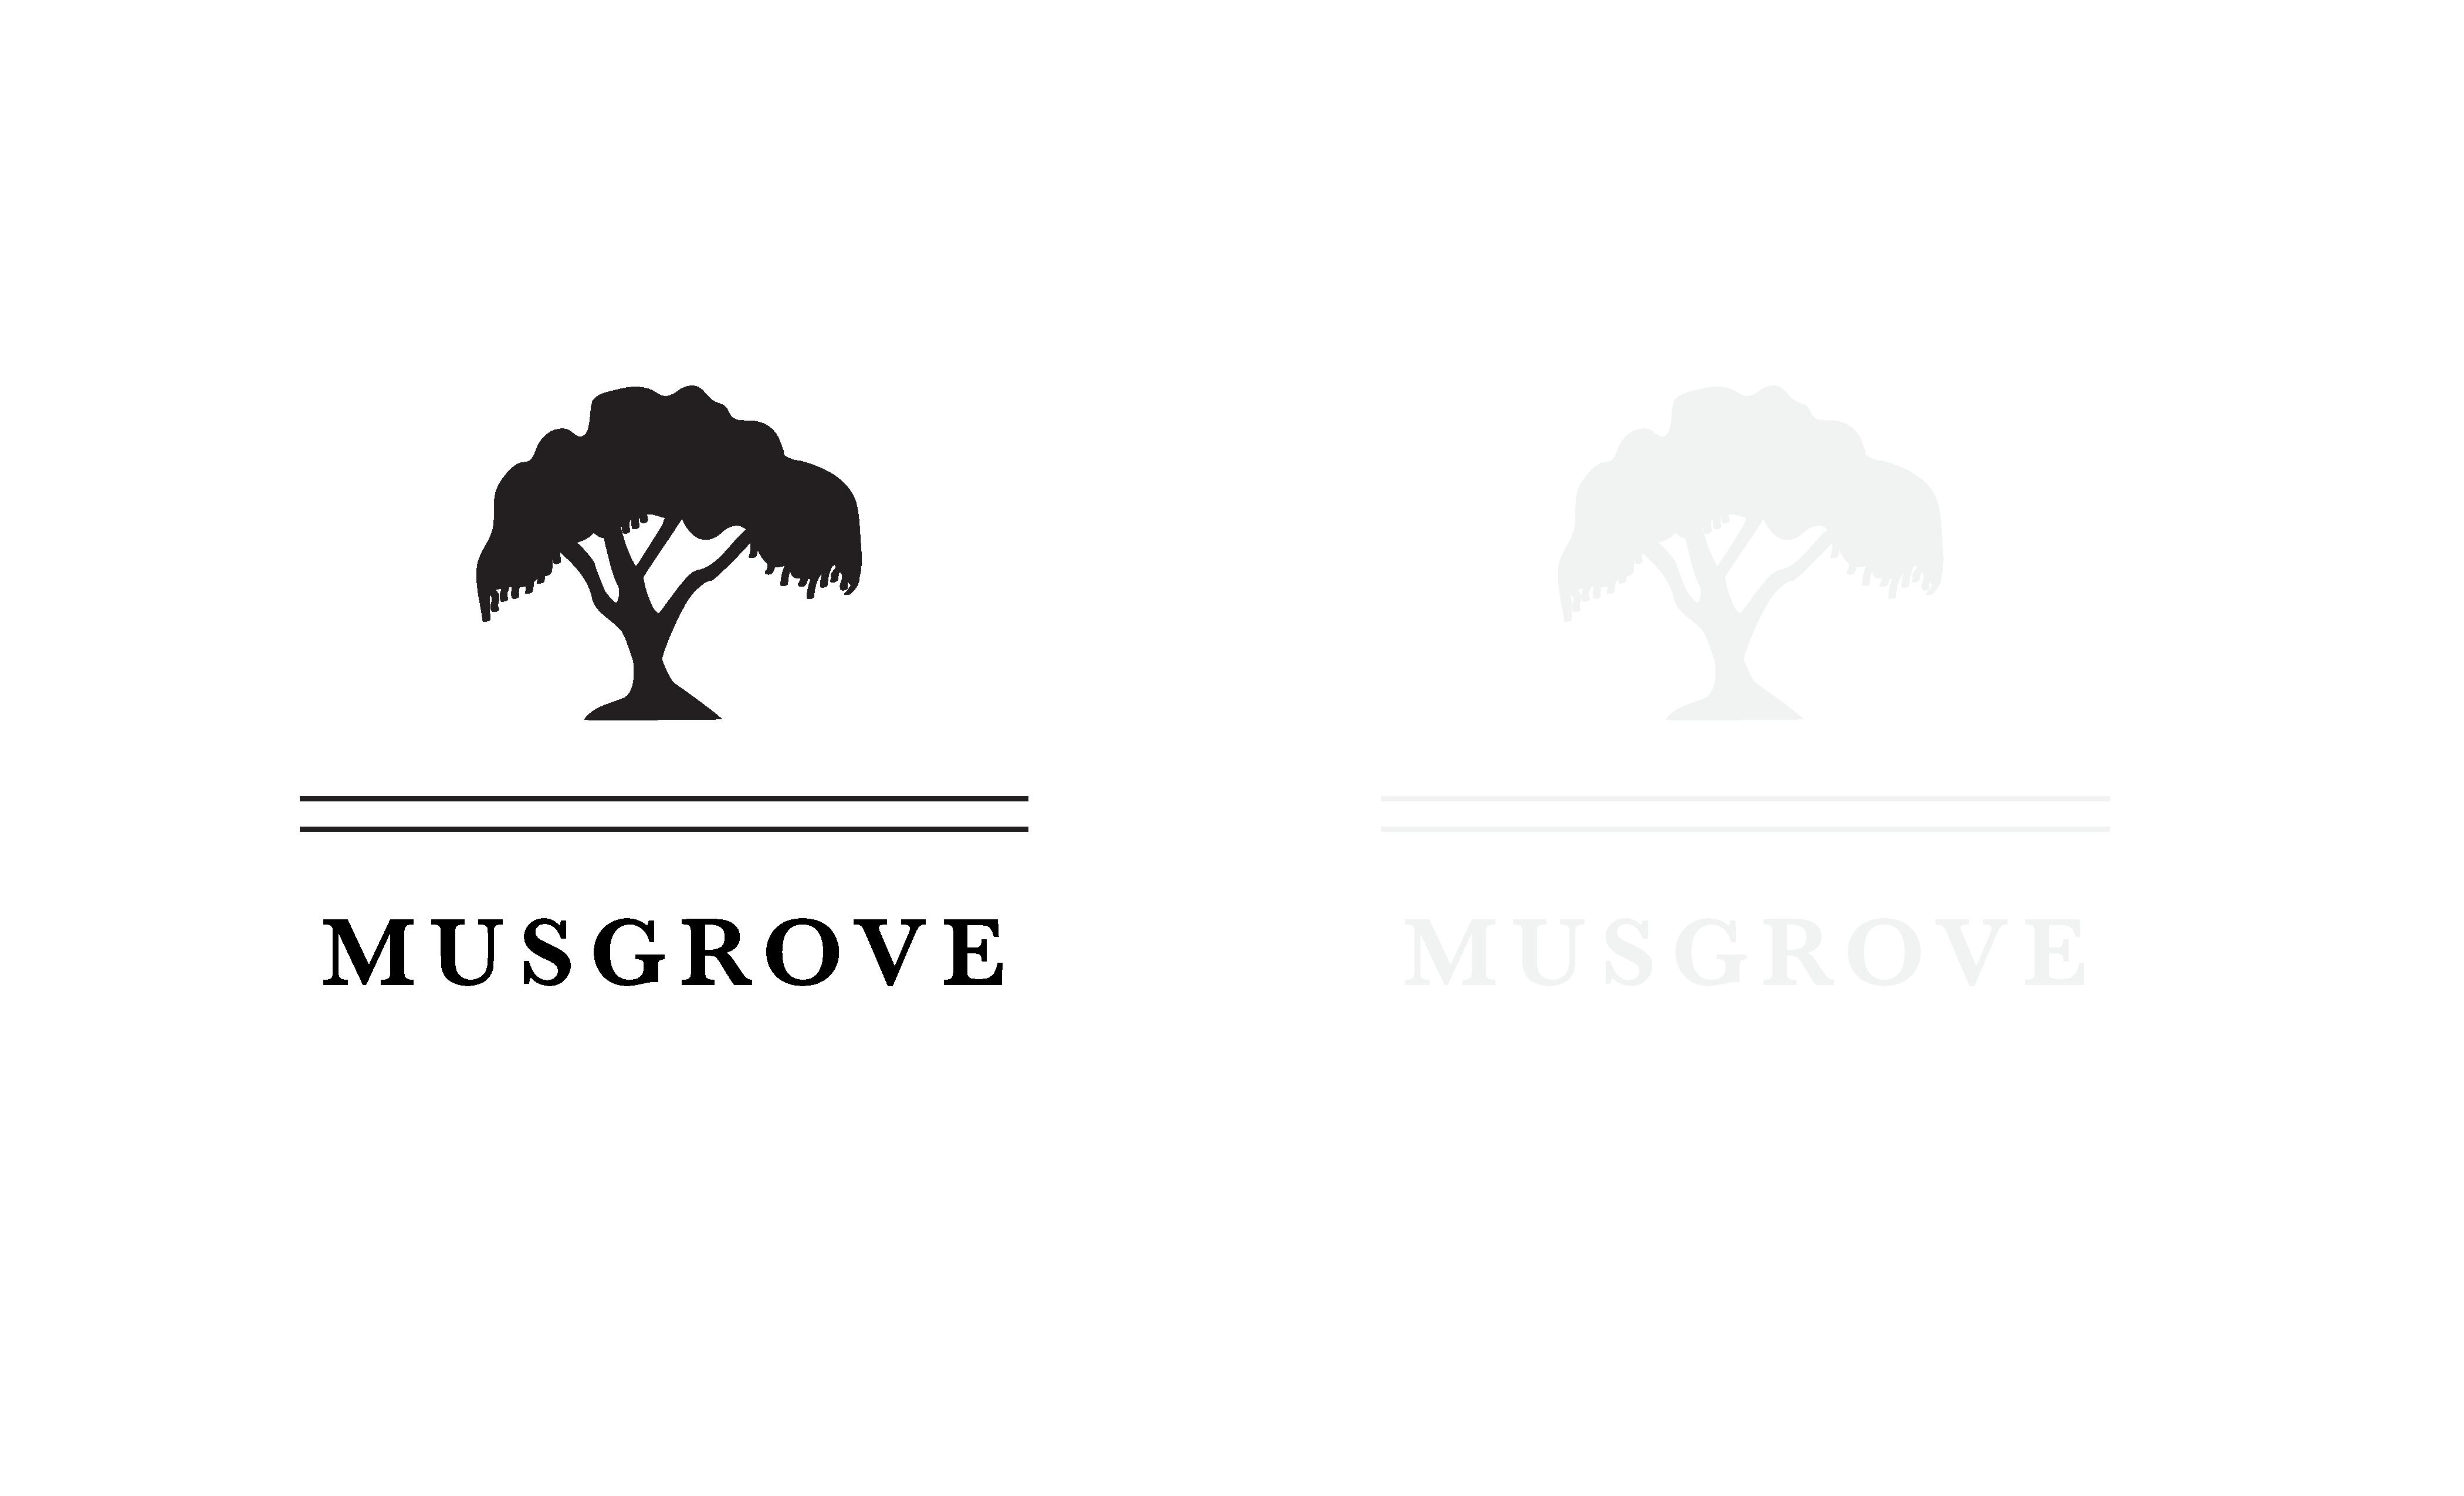 Musgrove Retreat The Knot